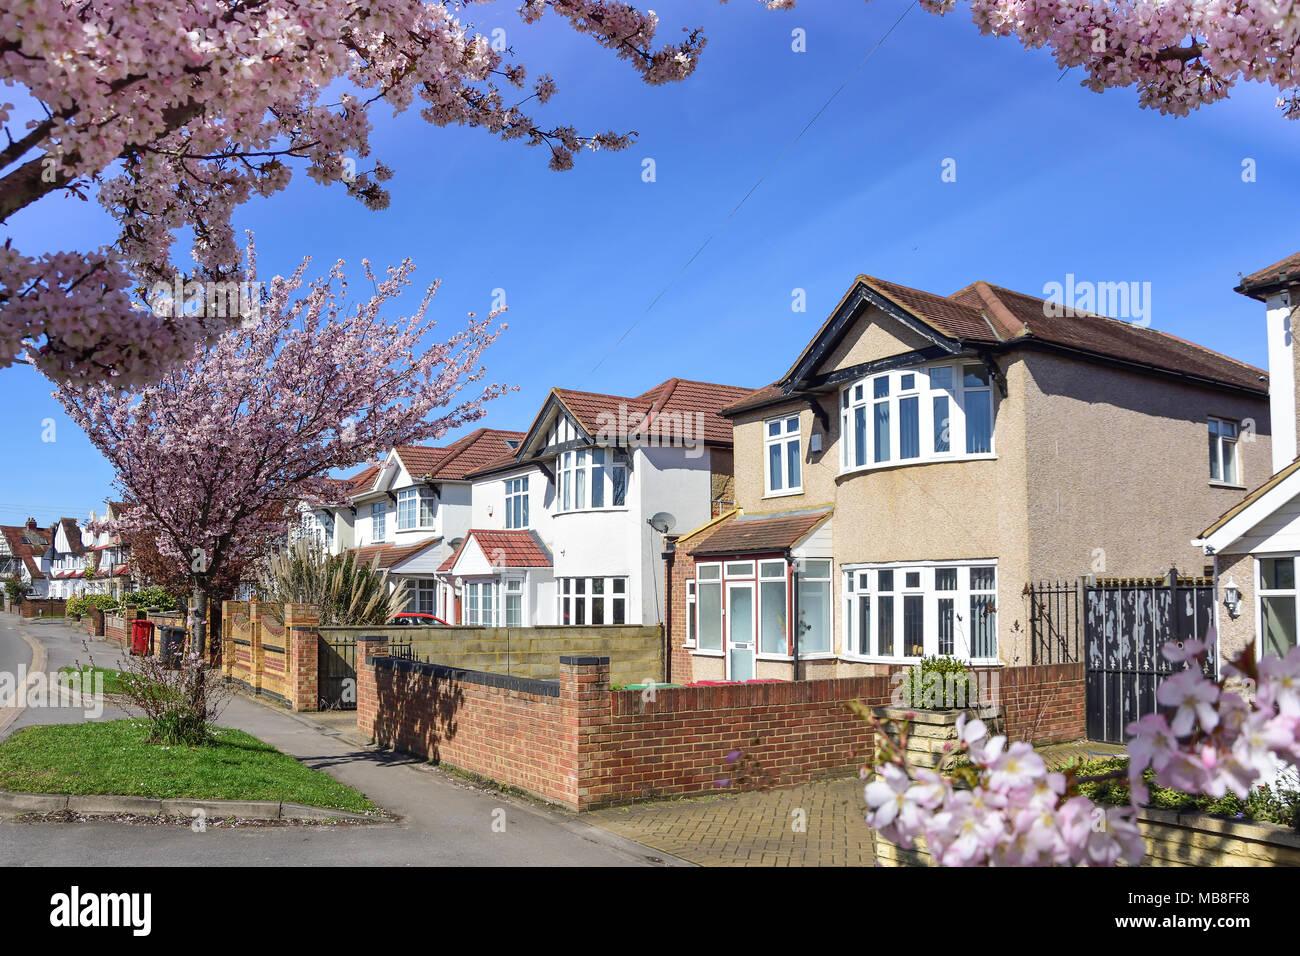 Street scene with semi-detached houses, Cippenham Lane, Slough, Berkshire, England, United Kingdom - Stock Image